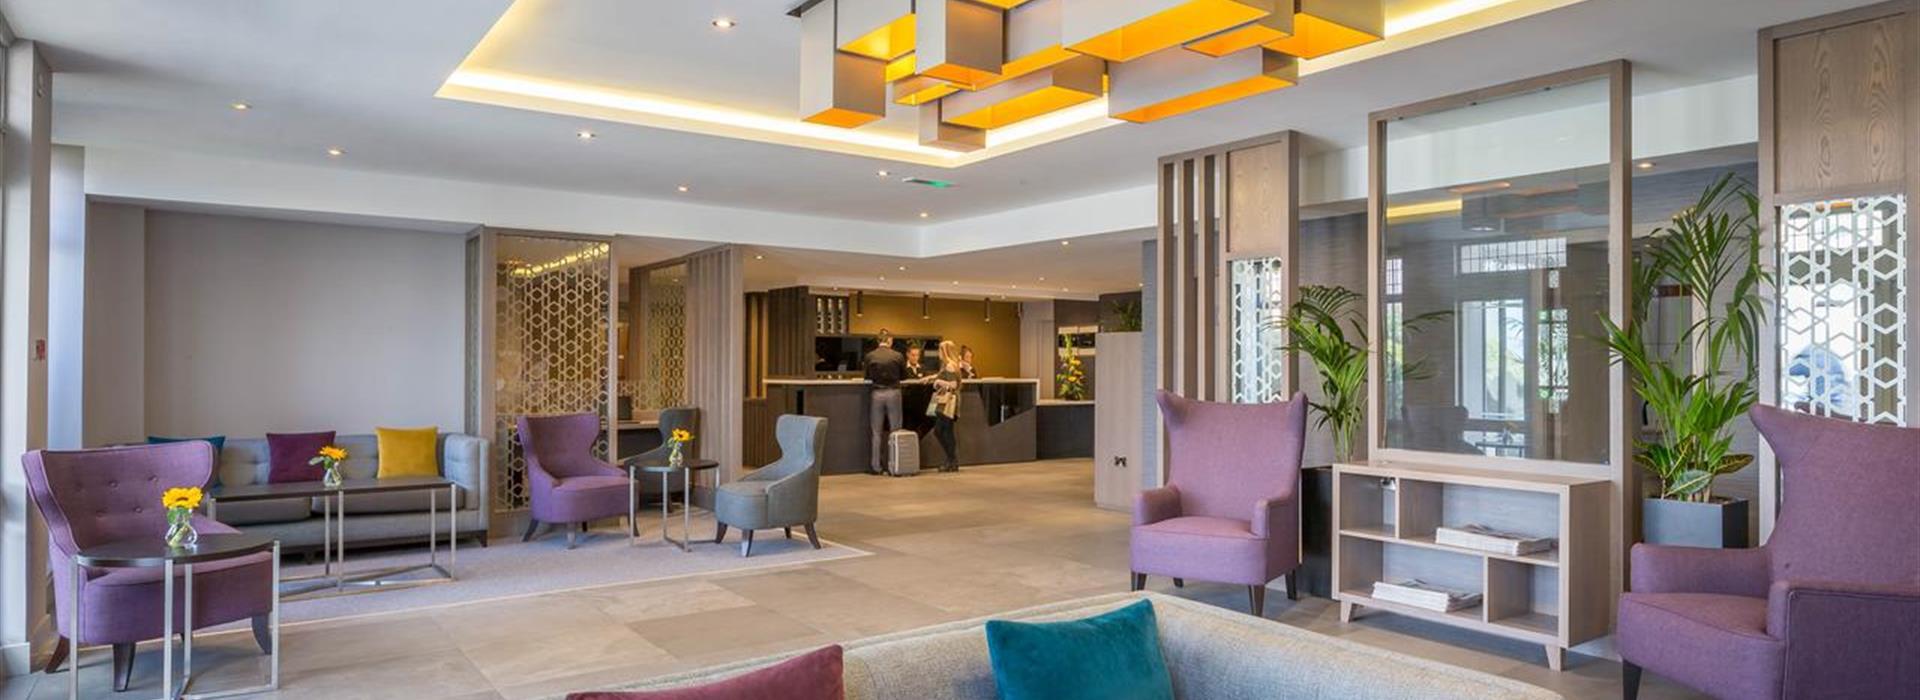 Maldron Hotel - Newlands Cross